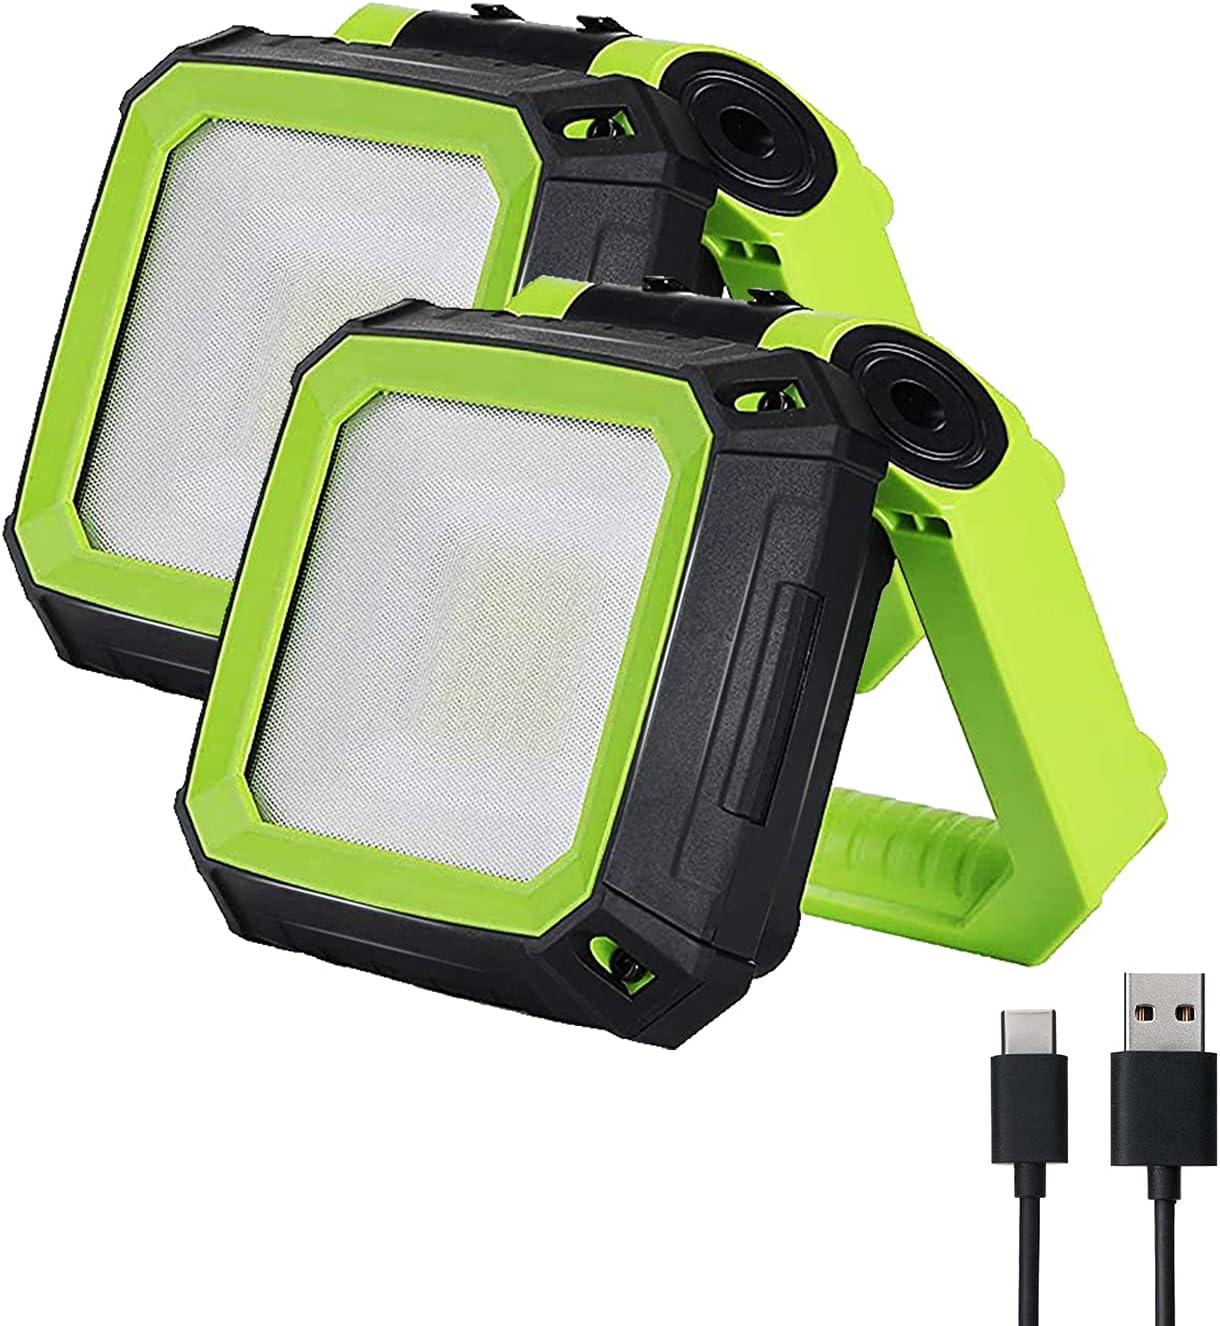 Tekstap 6500k Portable Flood Challenge the lowest Max 63% OFF price Led Rechargeable Light Lights